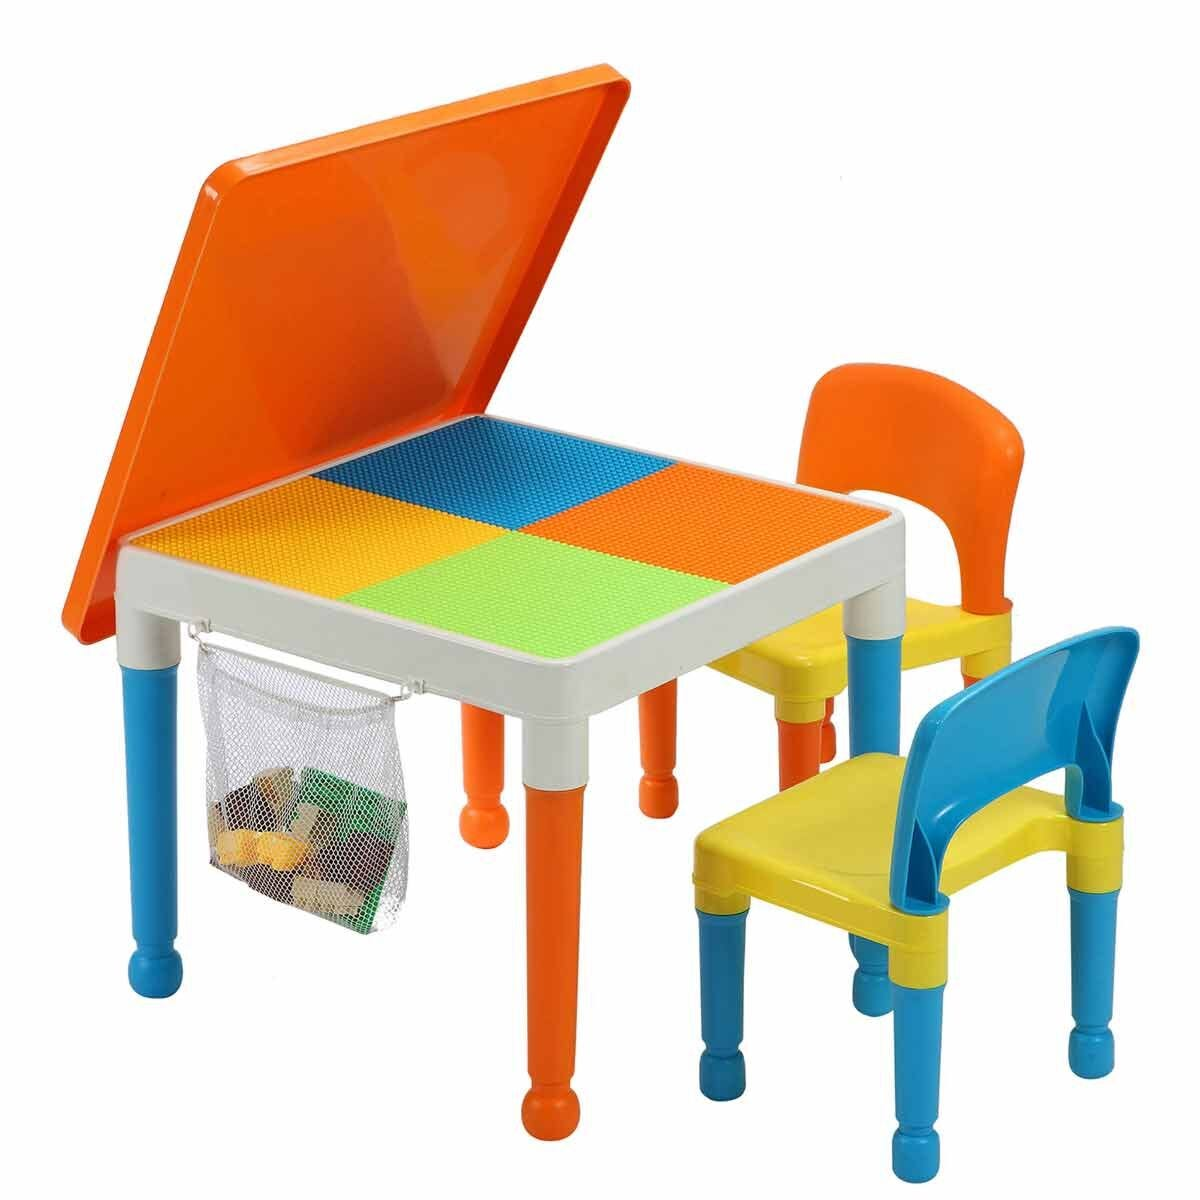 Liberty House Toys Multipurpose Activity Table Set with Storage Bag Orange